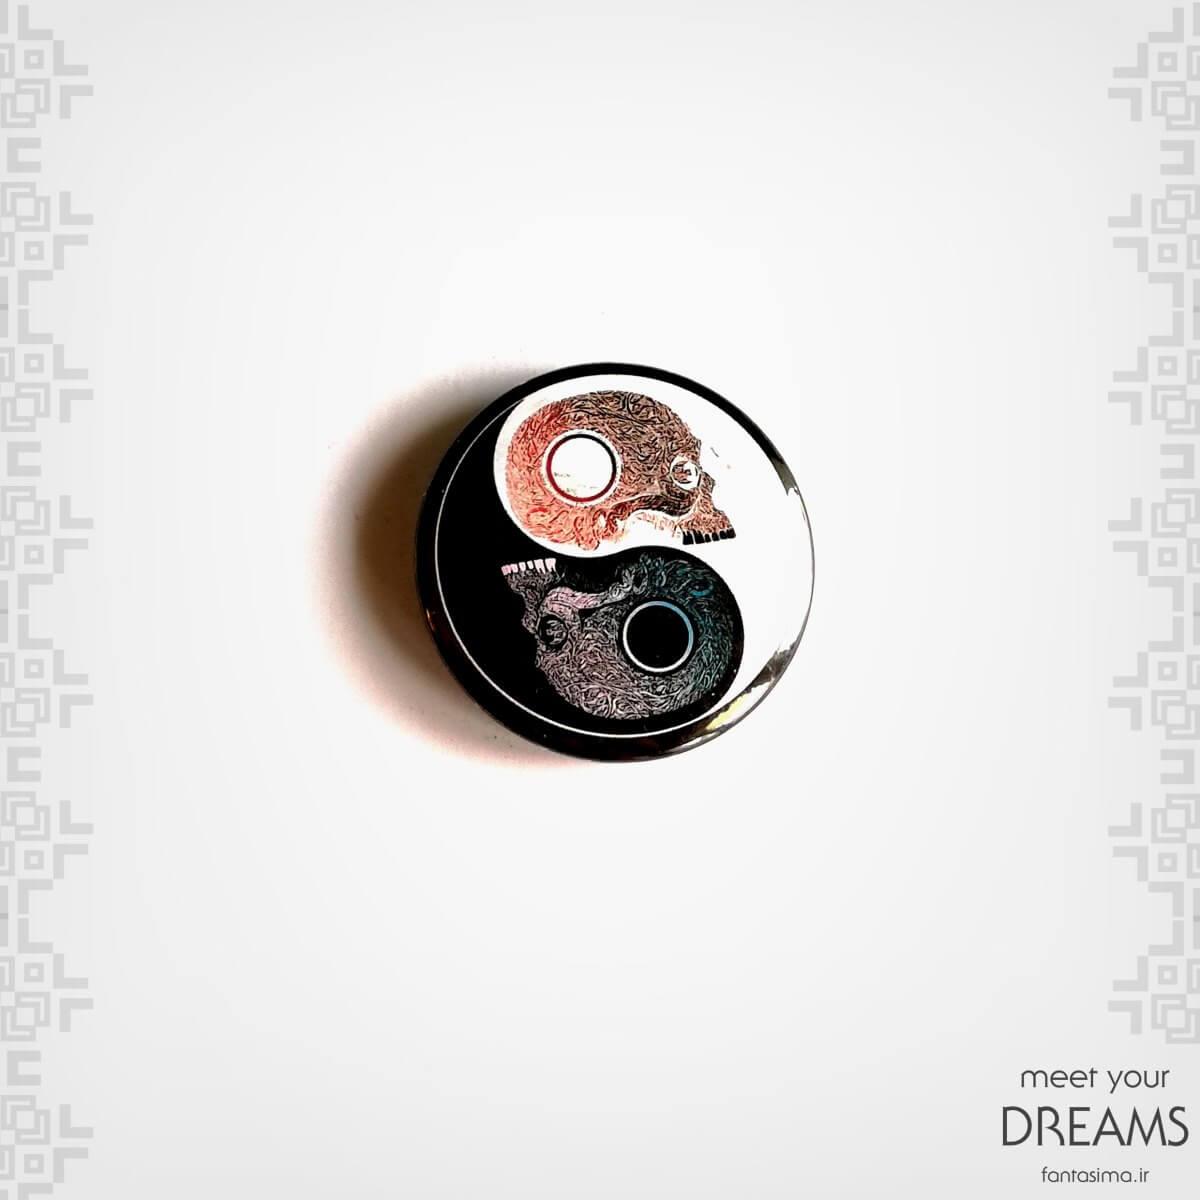 پیکسل فلزی نماد ying yang - اسکلت